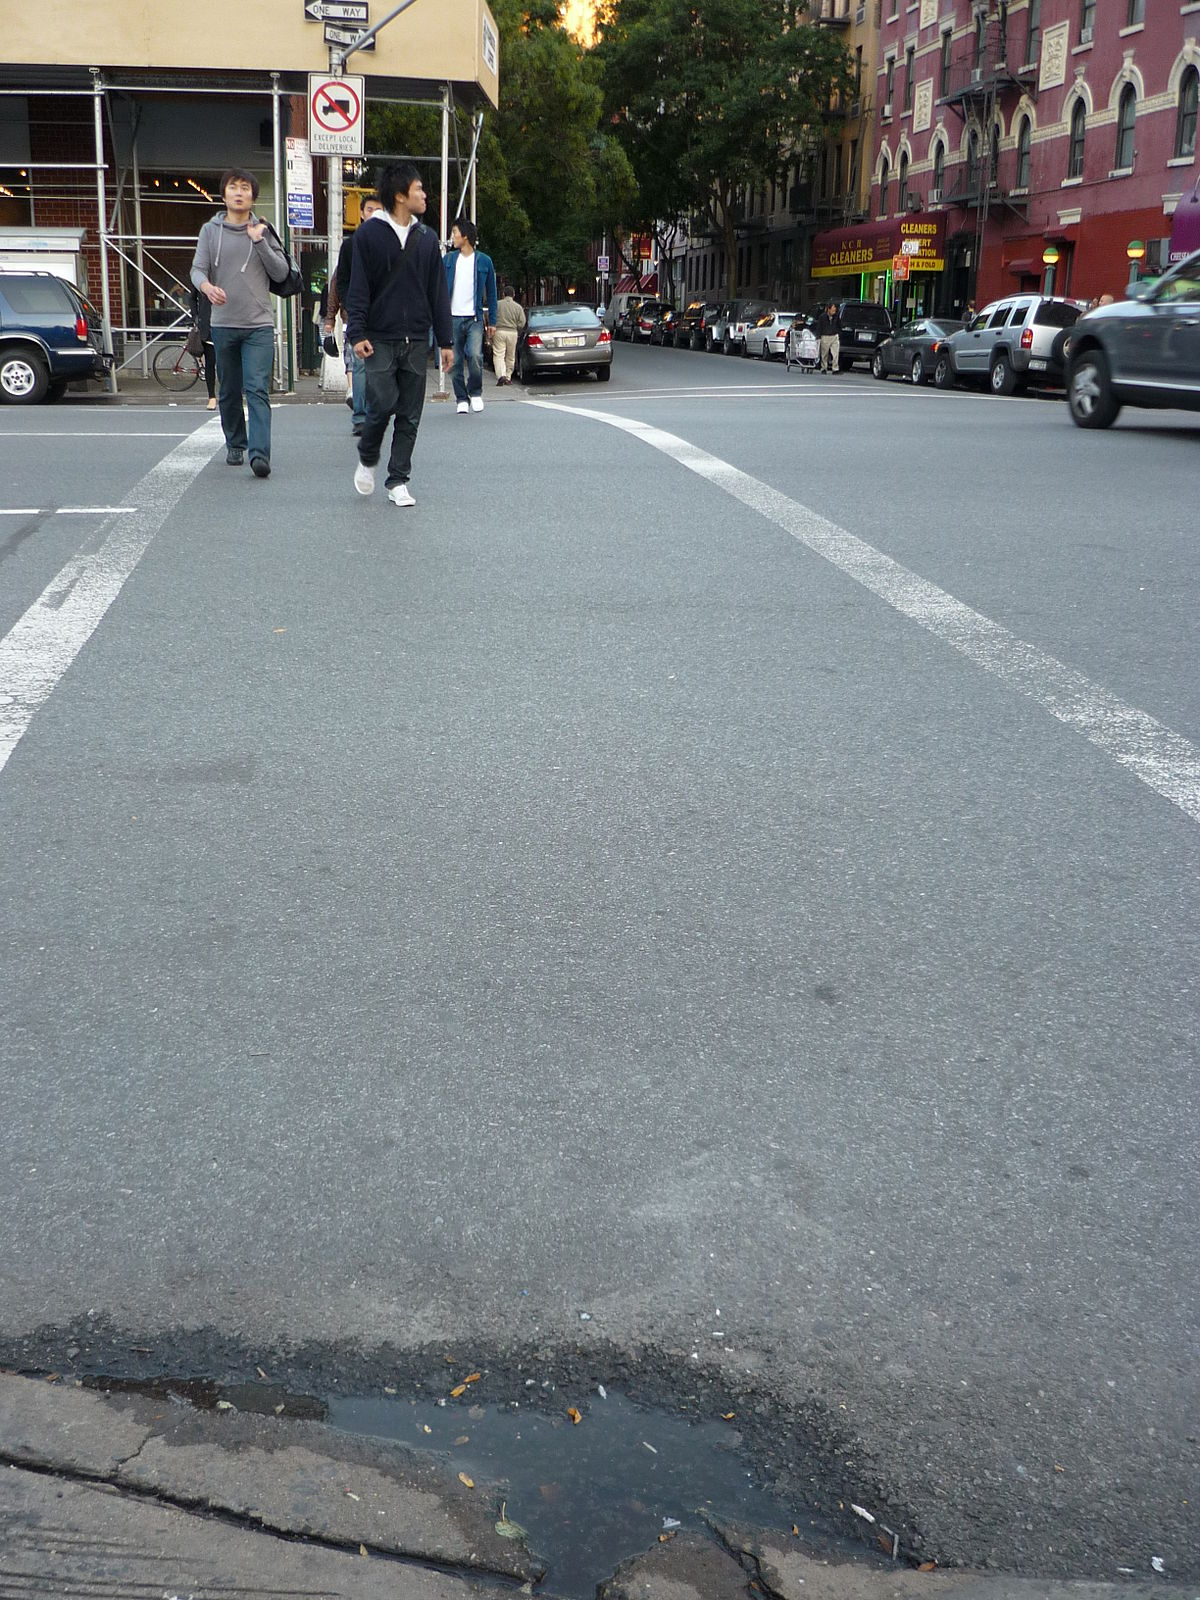 Big Apple Pothole And Sidewalk Protection Committee